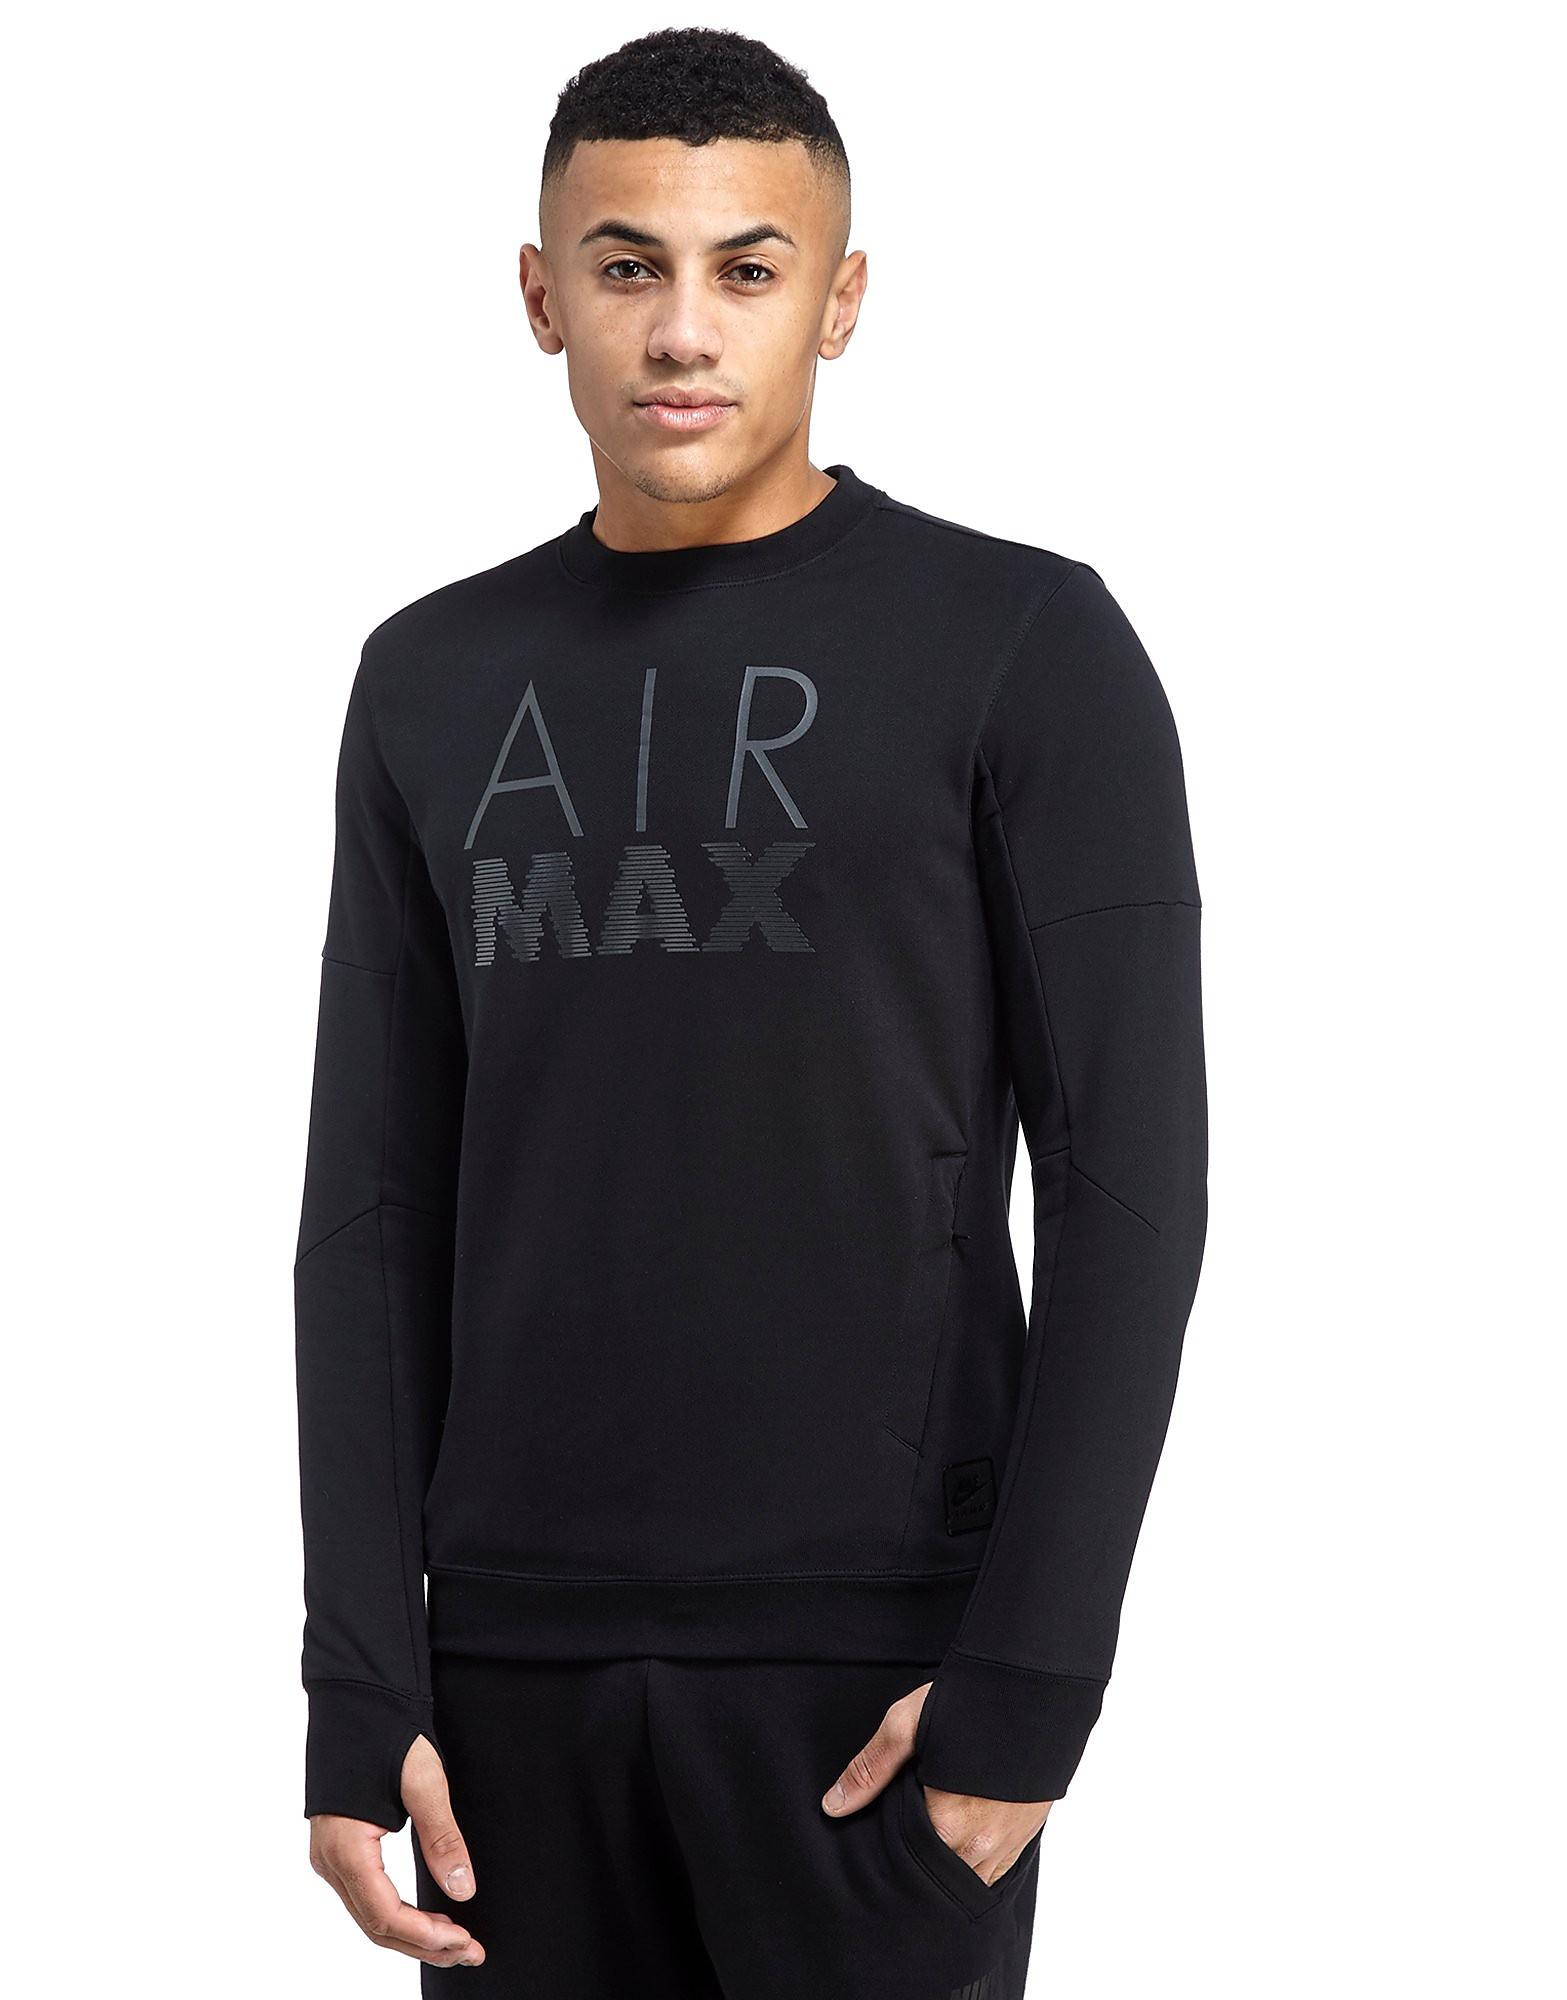 Nike Air Max Crew Sweatshirt